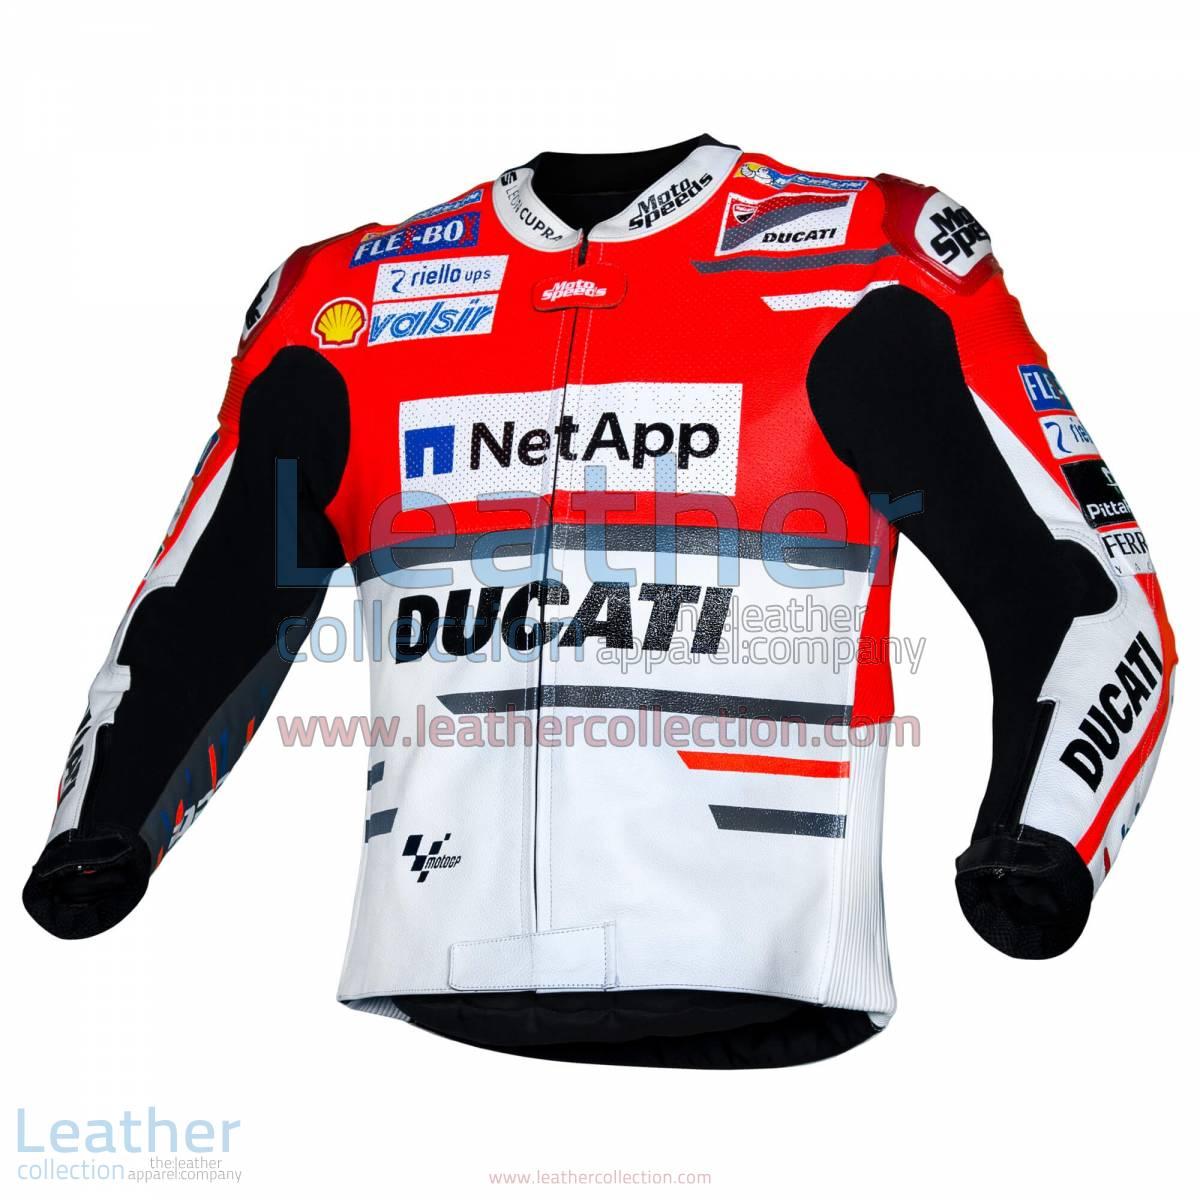 Andrea Dovizioso Ducati MotoGP 2018 Leather Jacket | Andrea Dovizioso Ducati MotoGP 2018 Leather Jacket